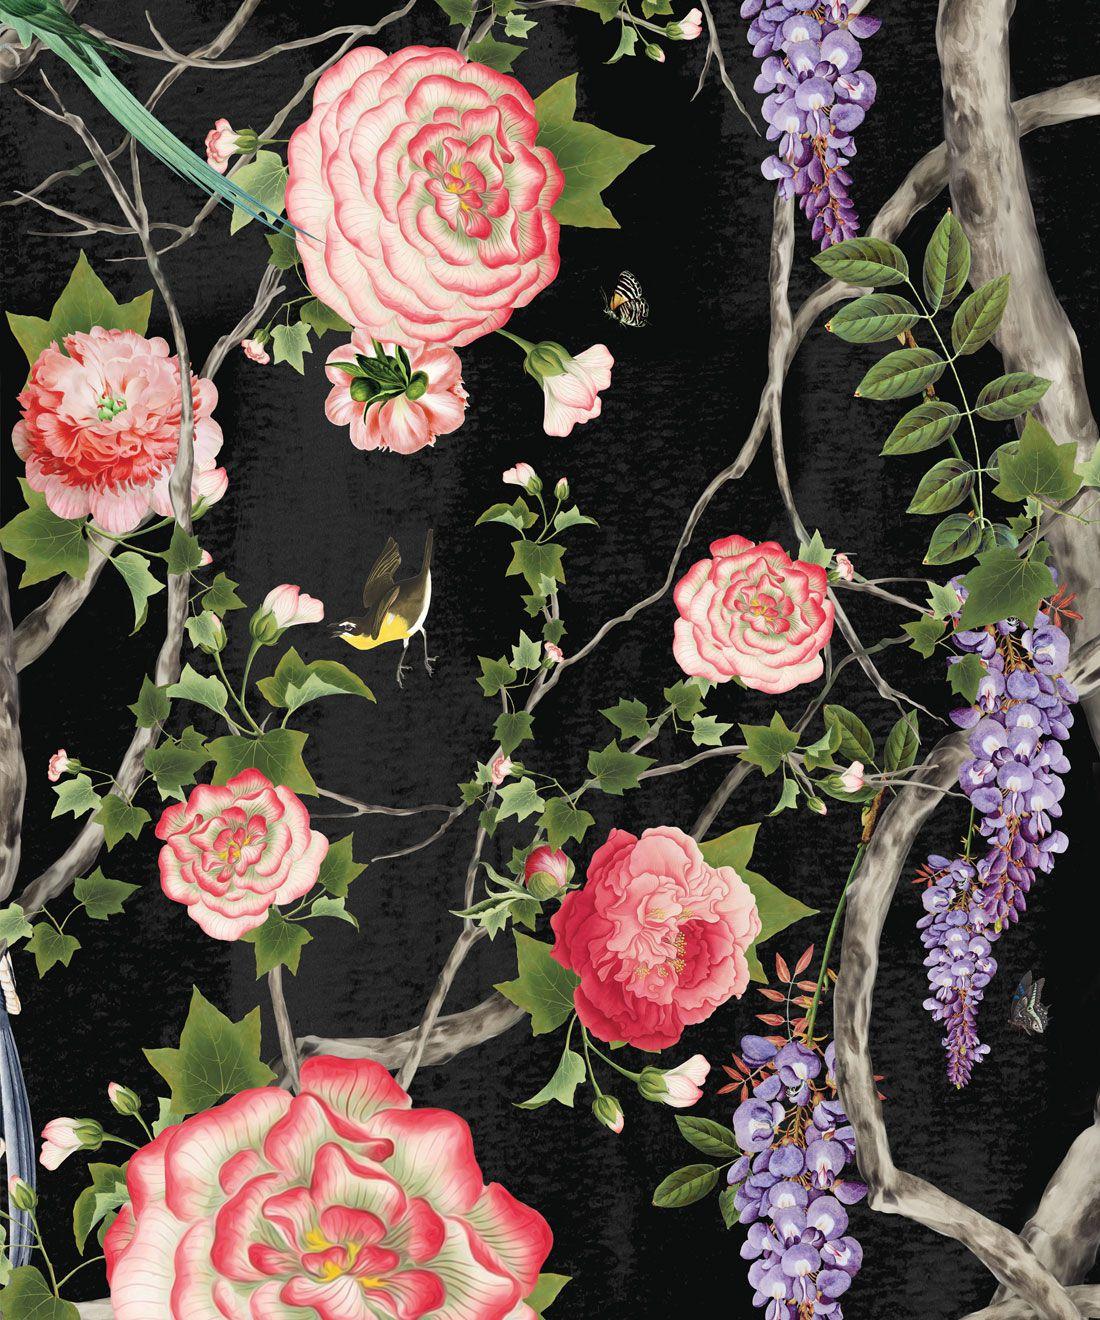 Empress Wallpaper • Romantic Wallpaper • Floral Wallpaper • Chinoiserie Wallpaper • Black Night colour wallpaper swatch